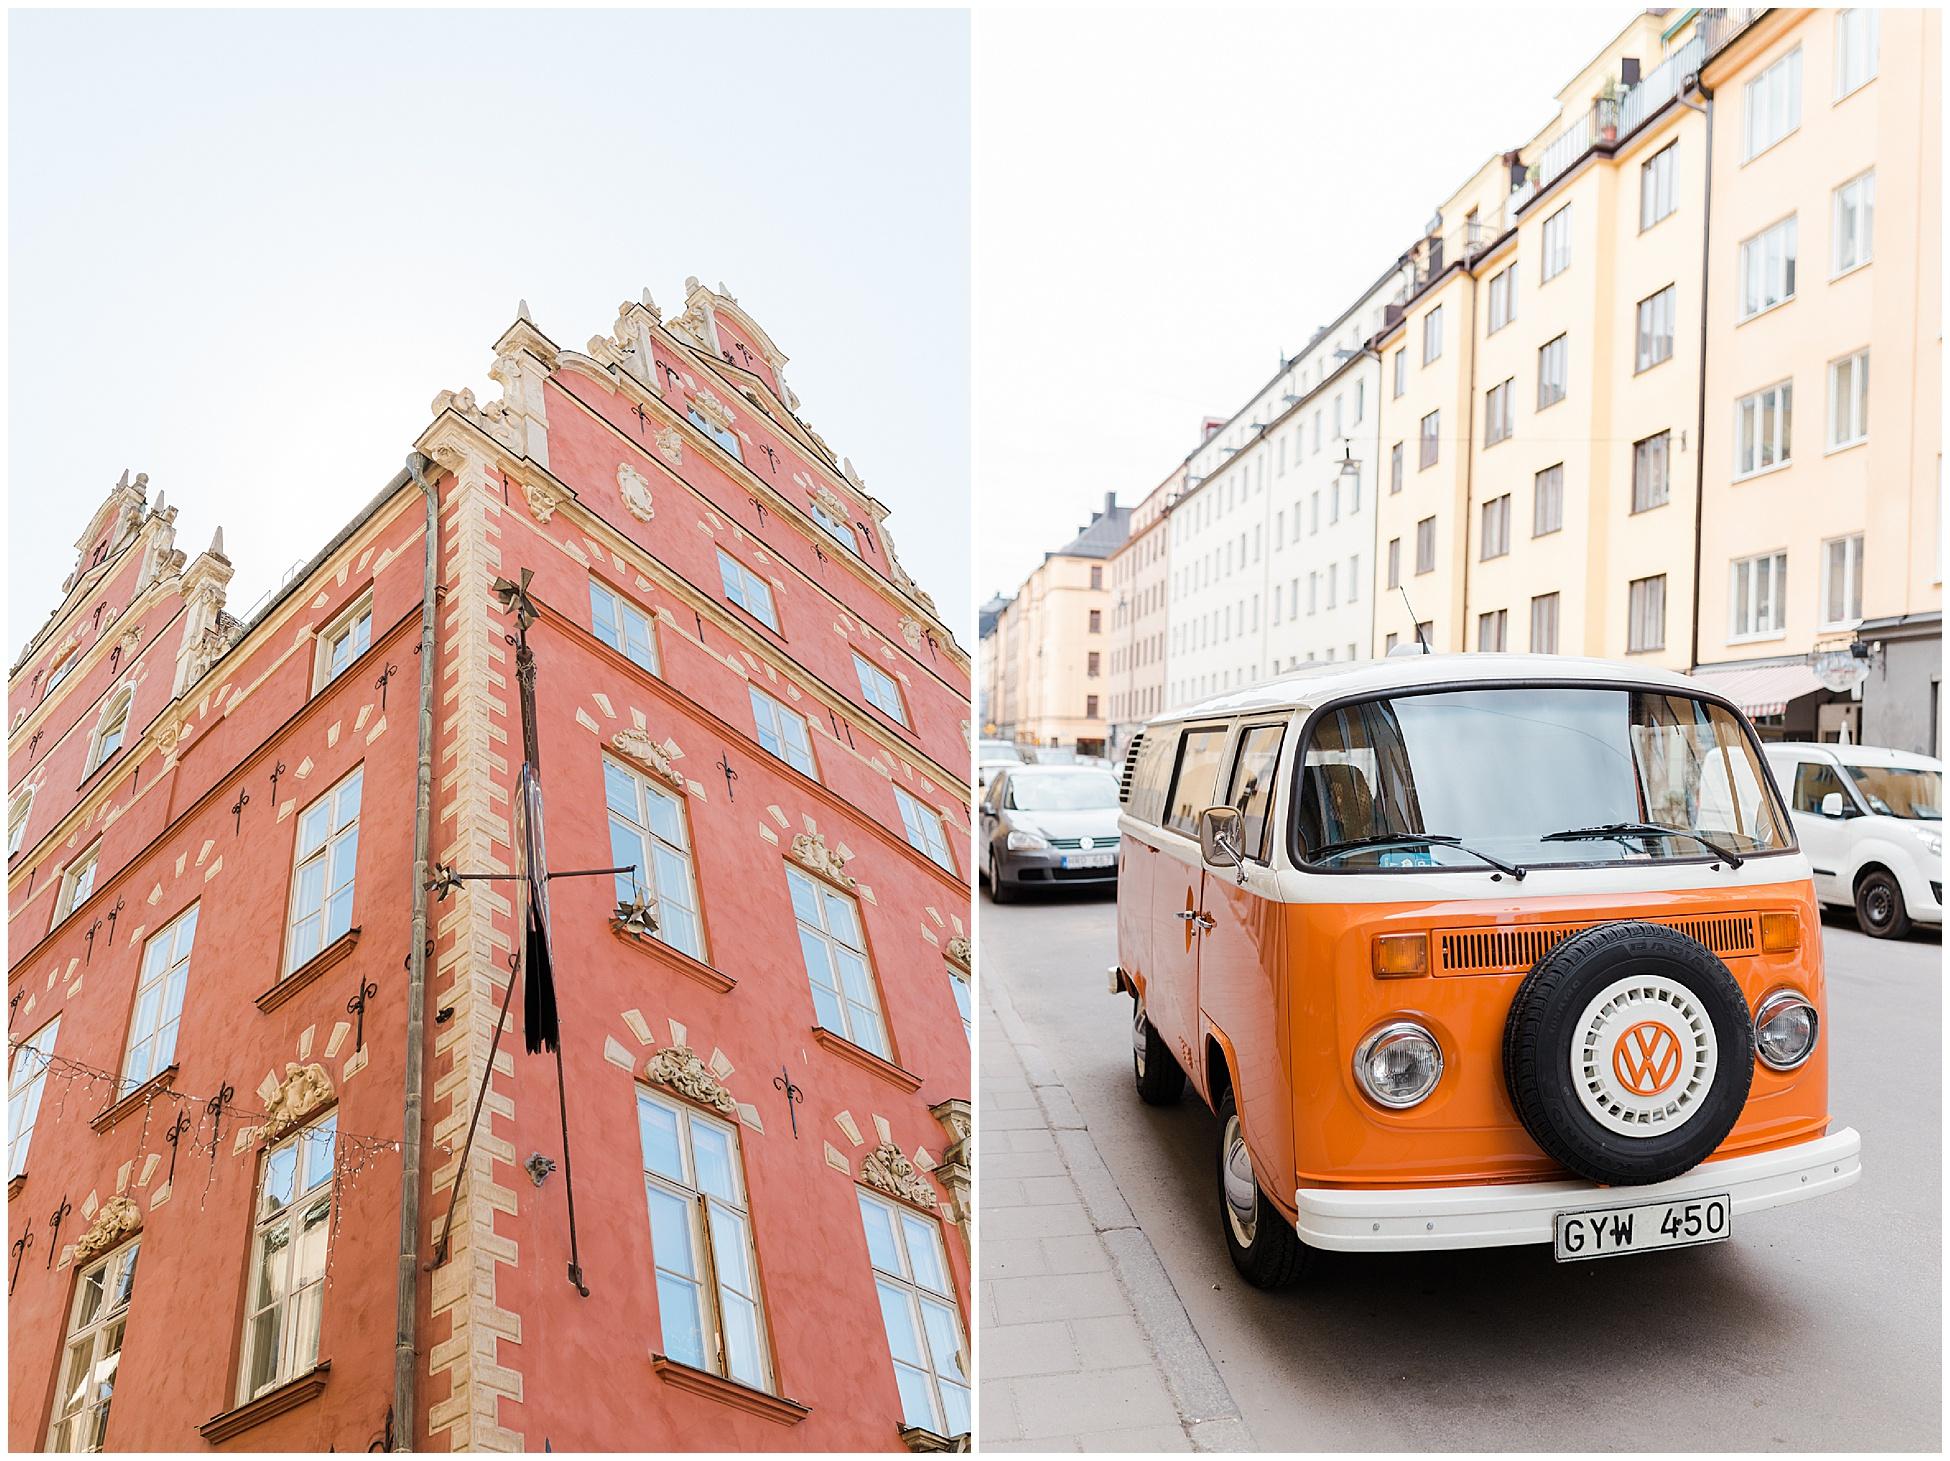 stockholm-011.jpg